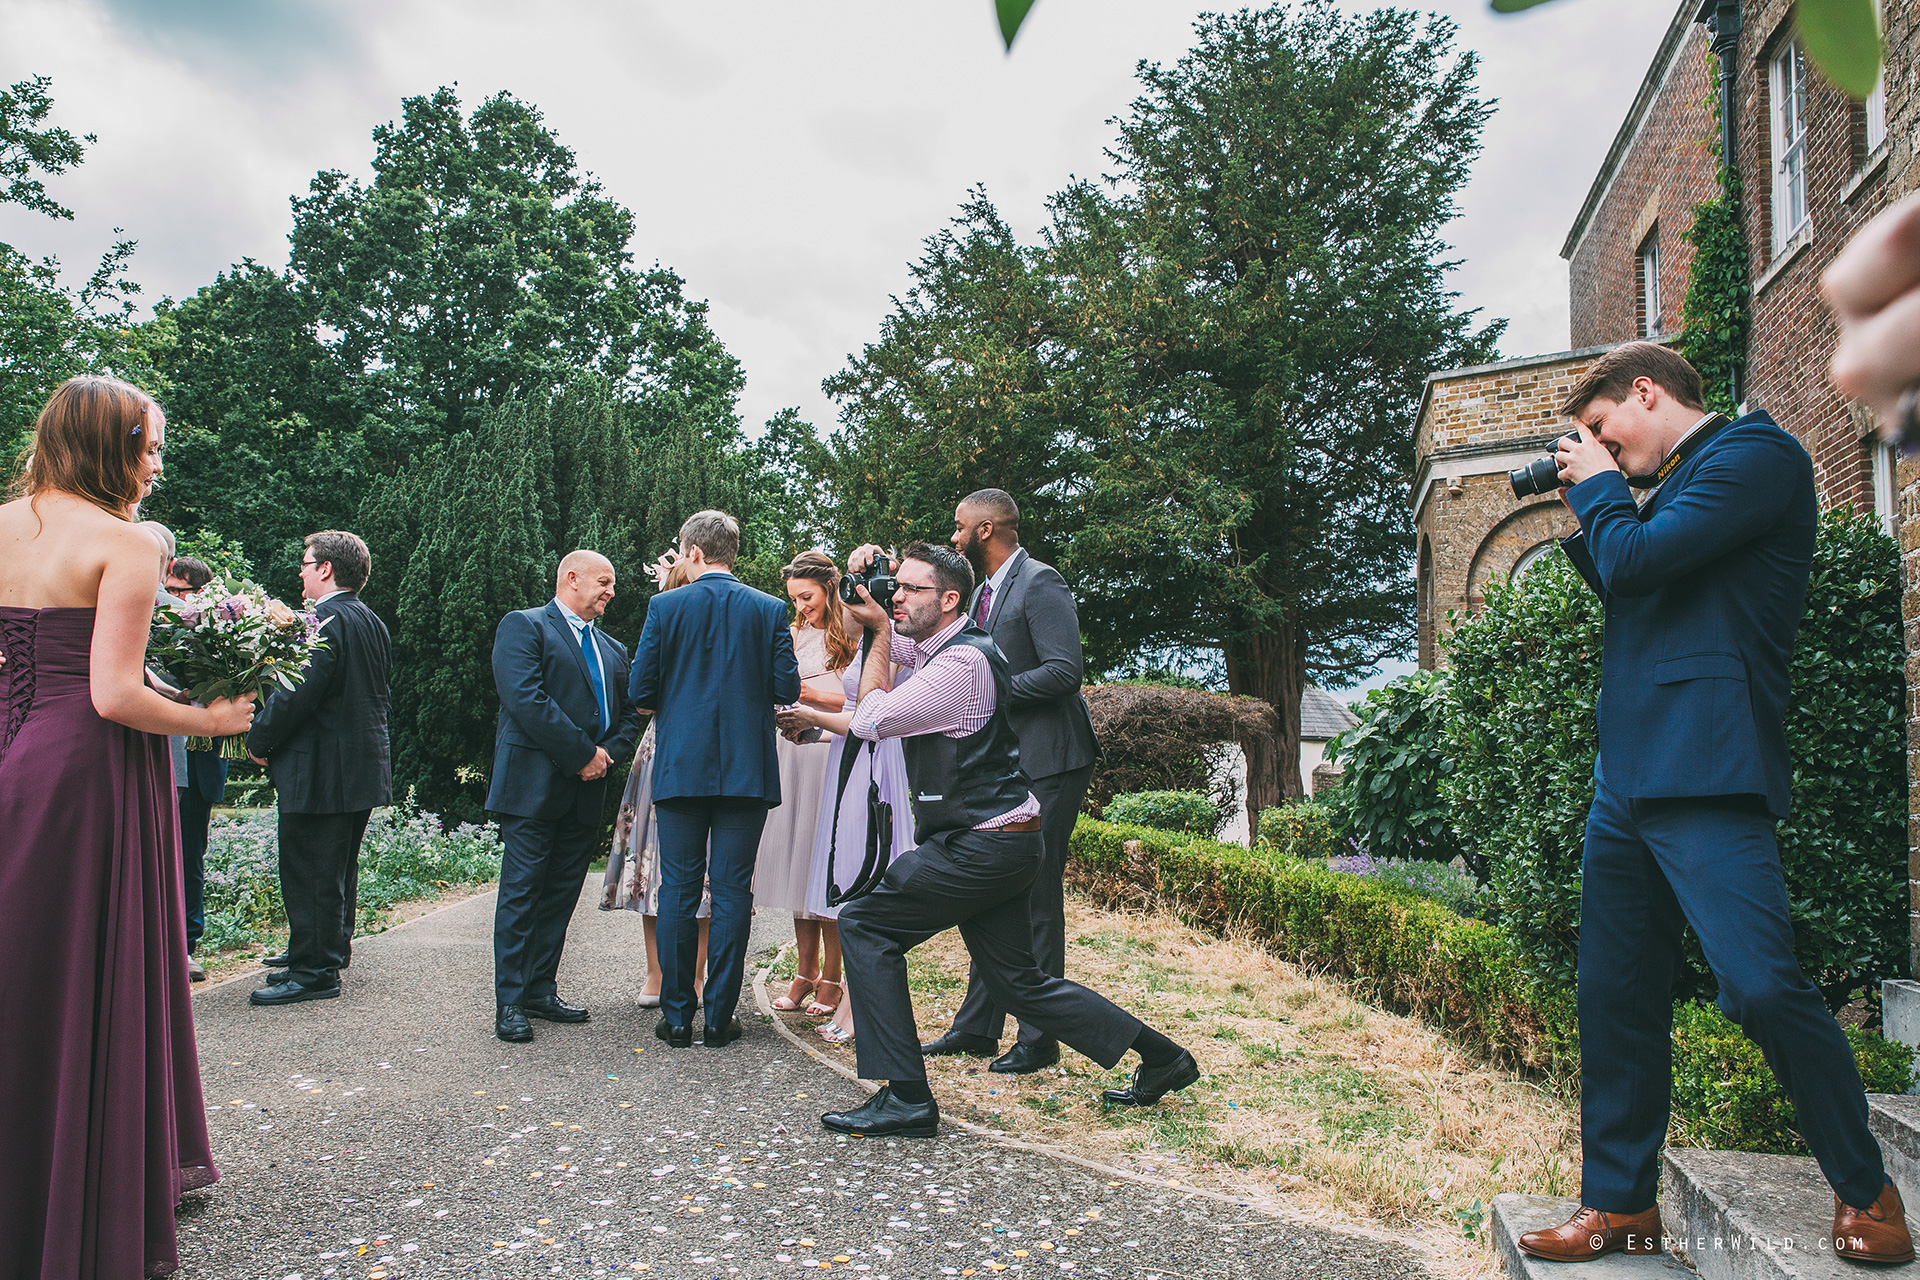 0617_London_Croydon_Clapham_Wedding_Photographer_Esther_Wild_Photography_IMG_5421.jpg